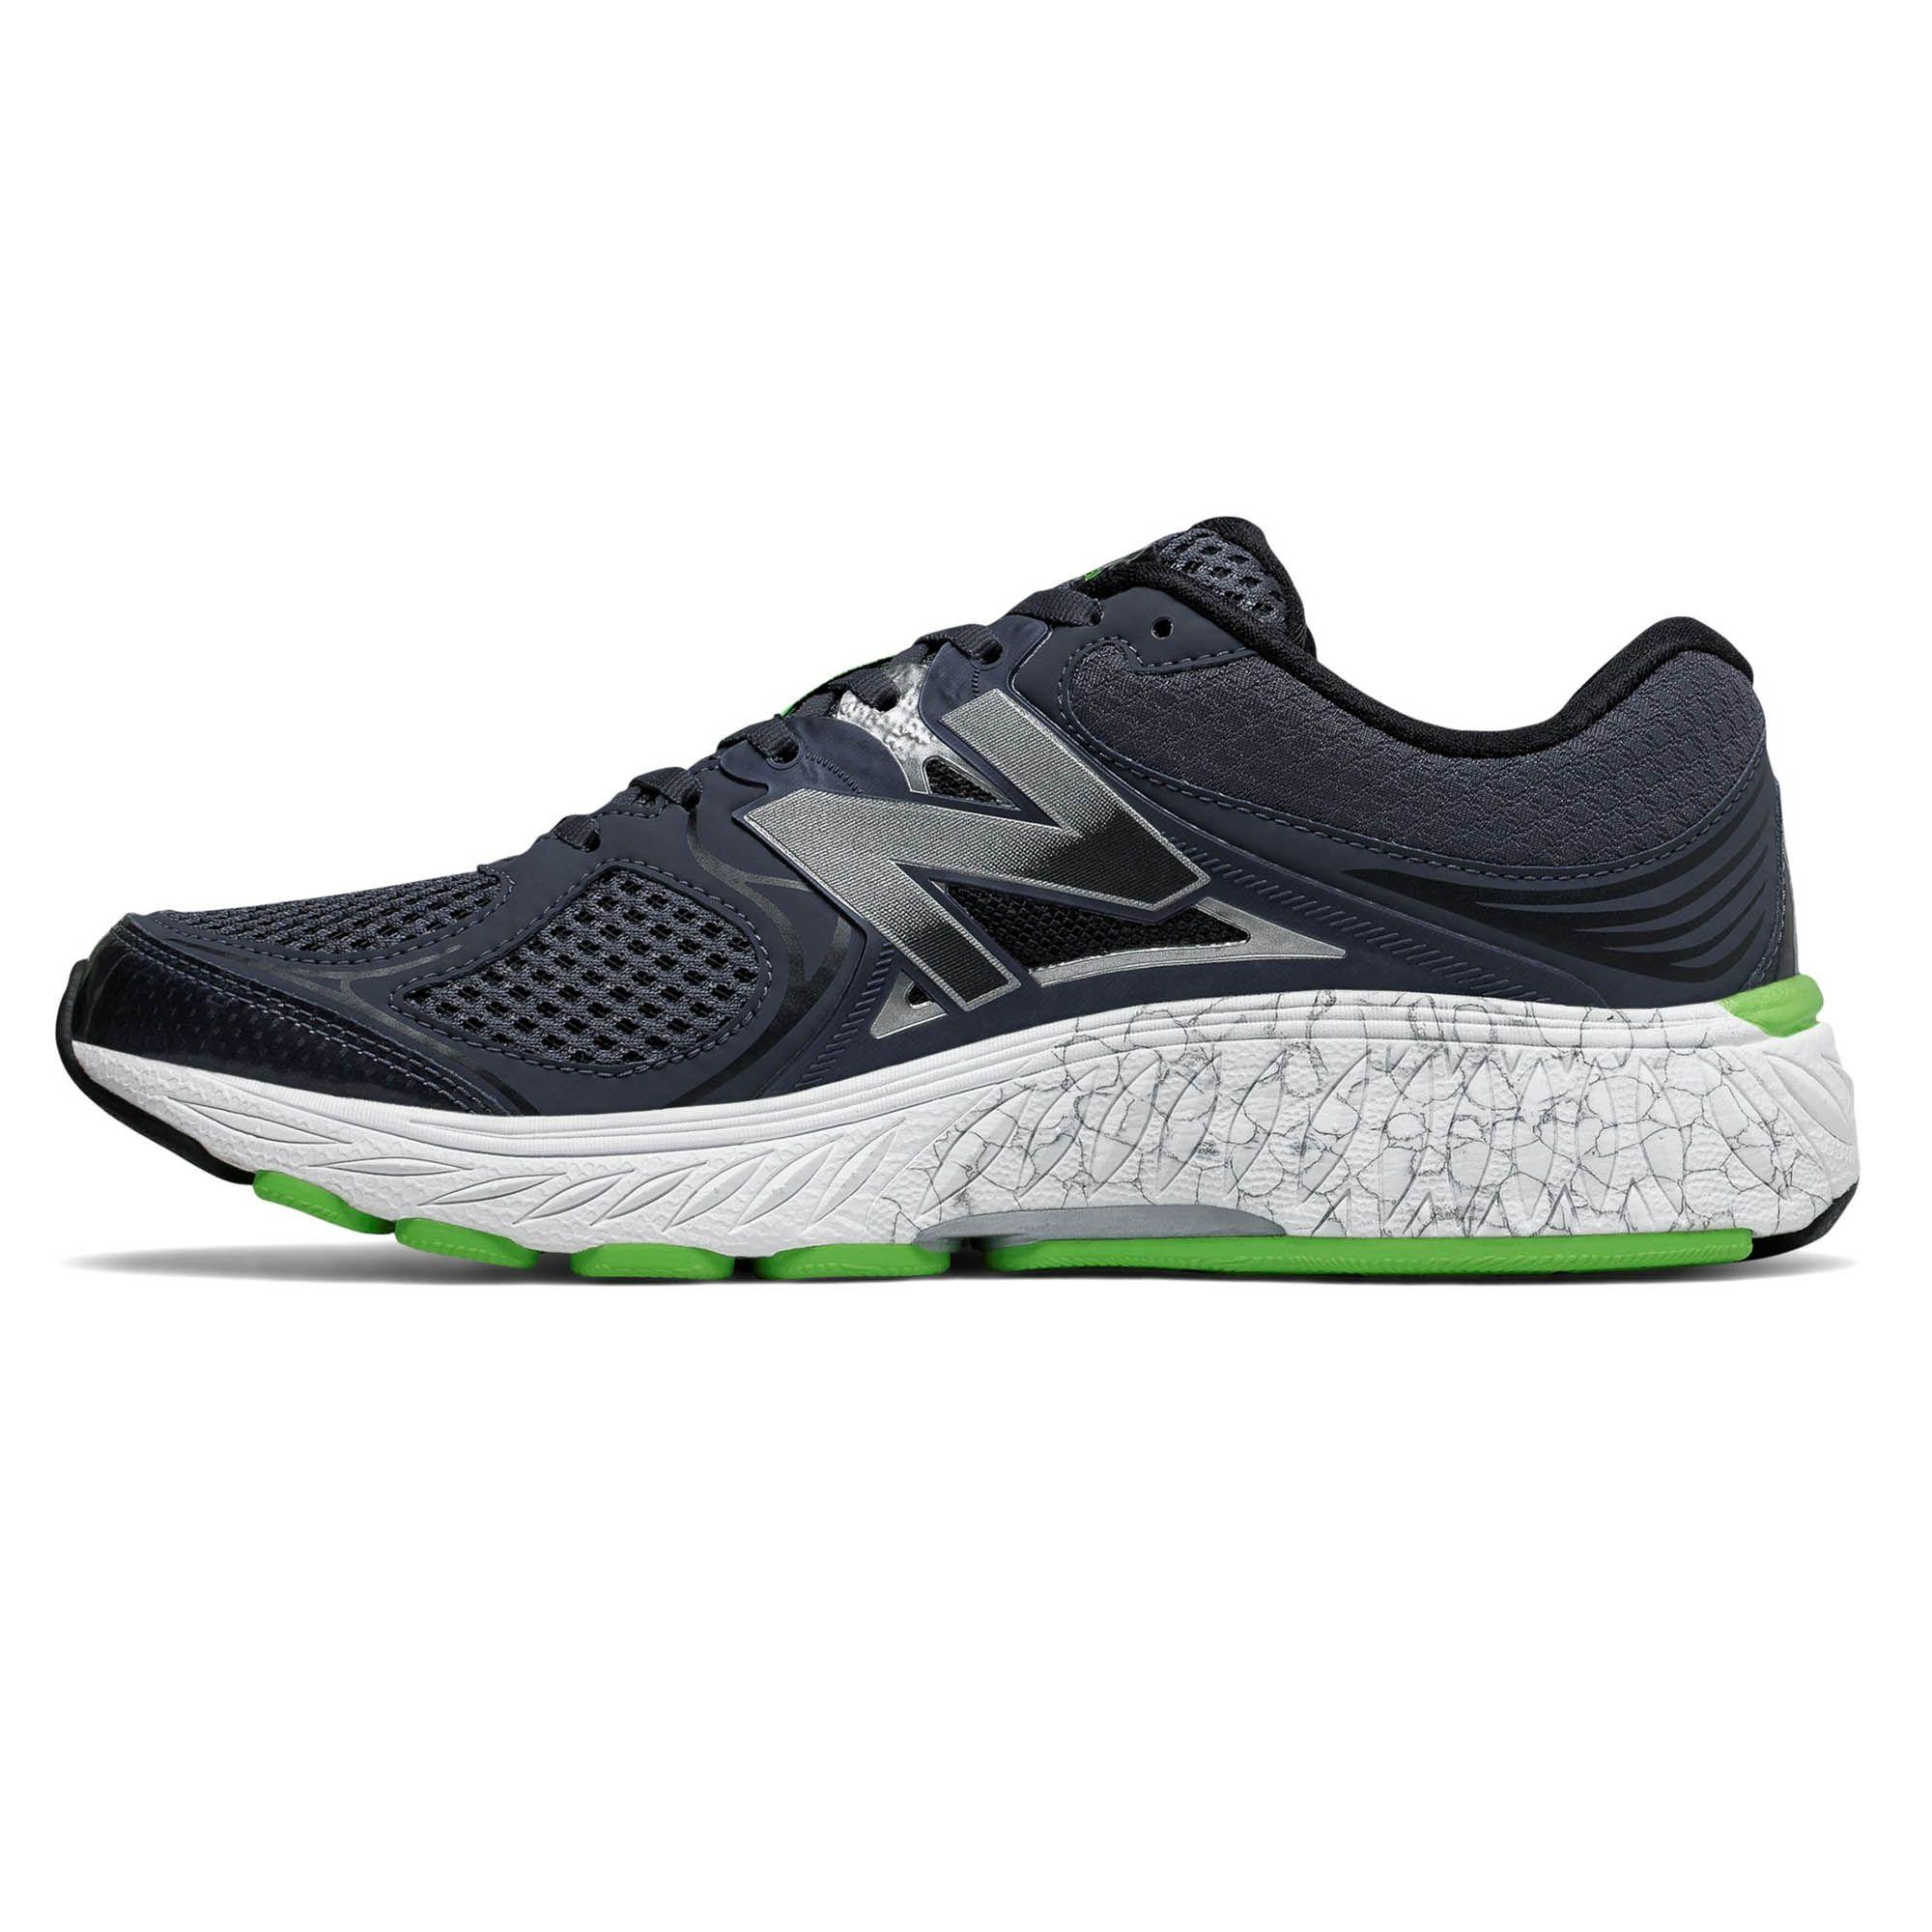 New Balance 940v3 Mens Running Shoes - Sweatband.com